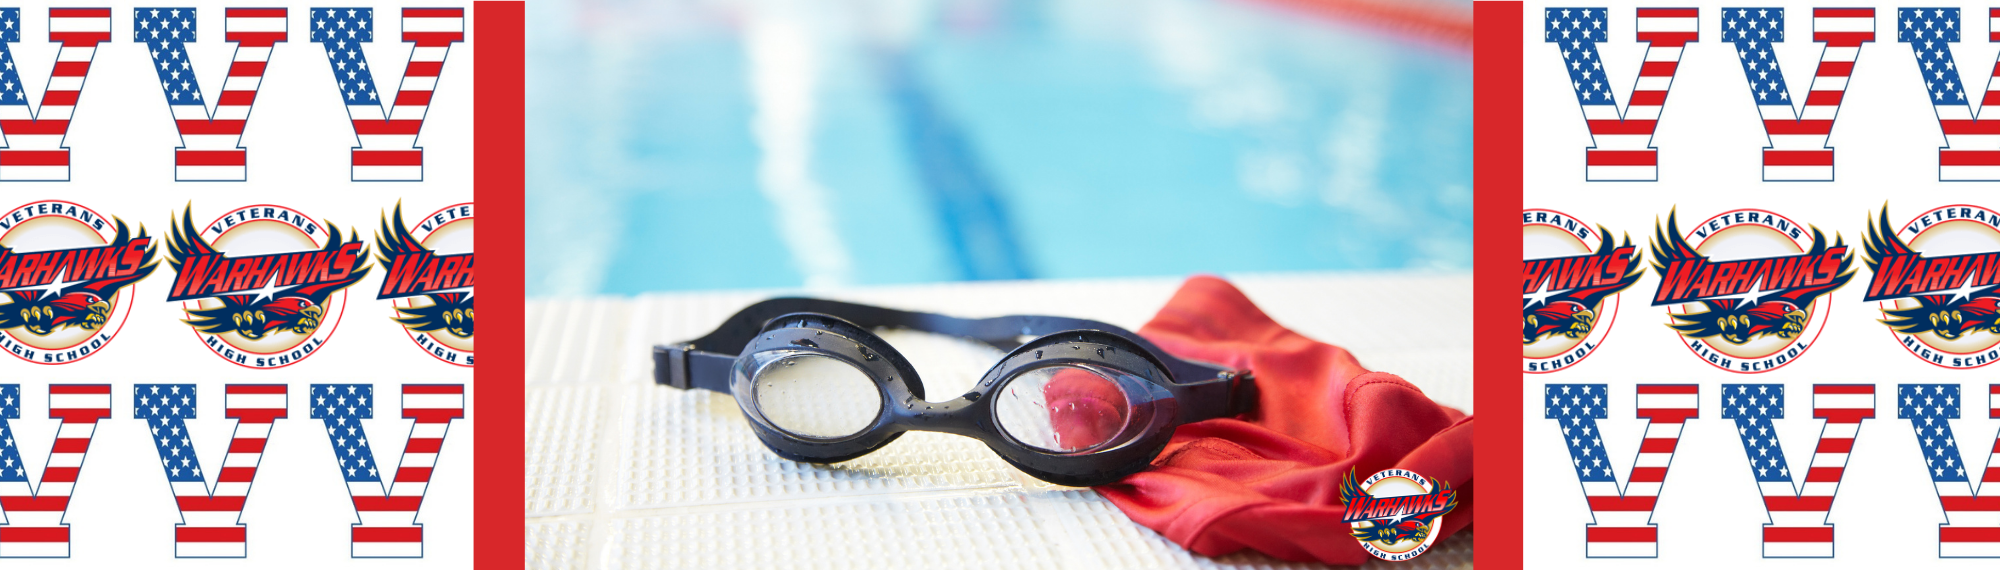 Warhawk Swimming